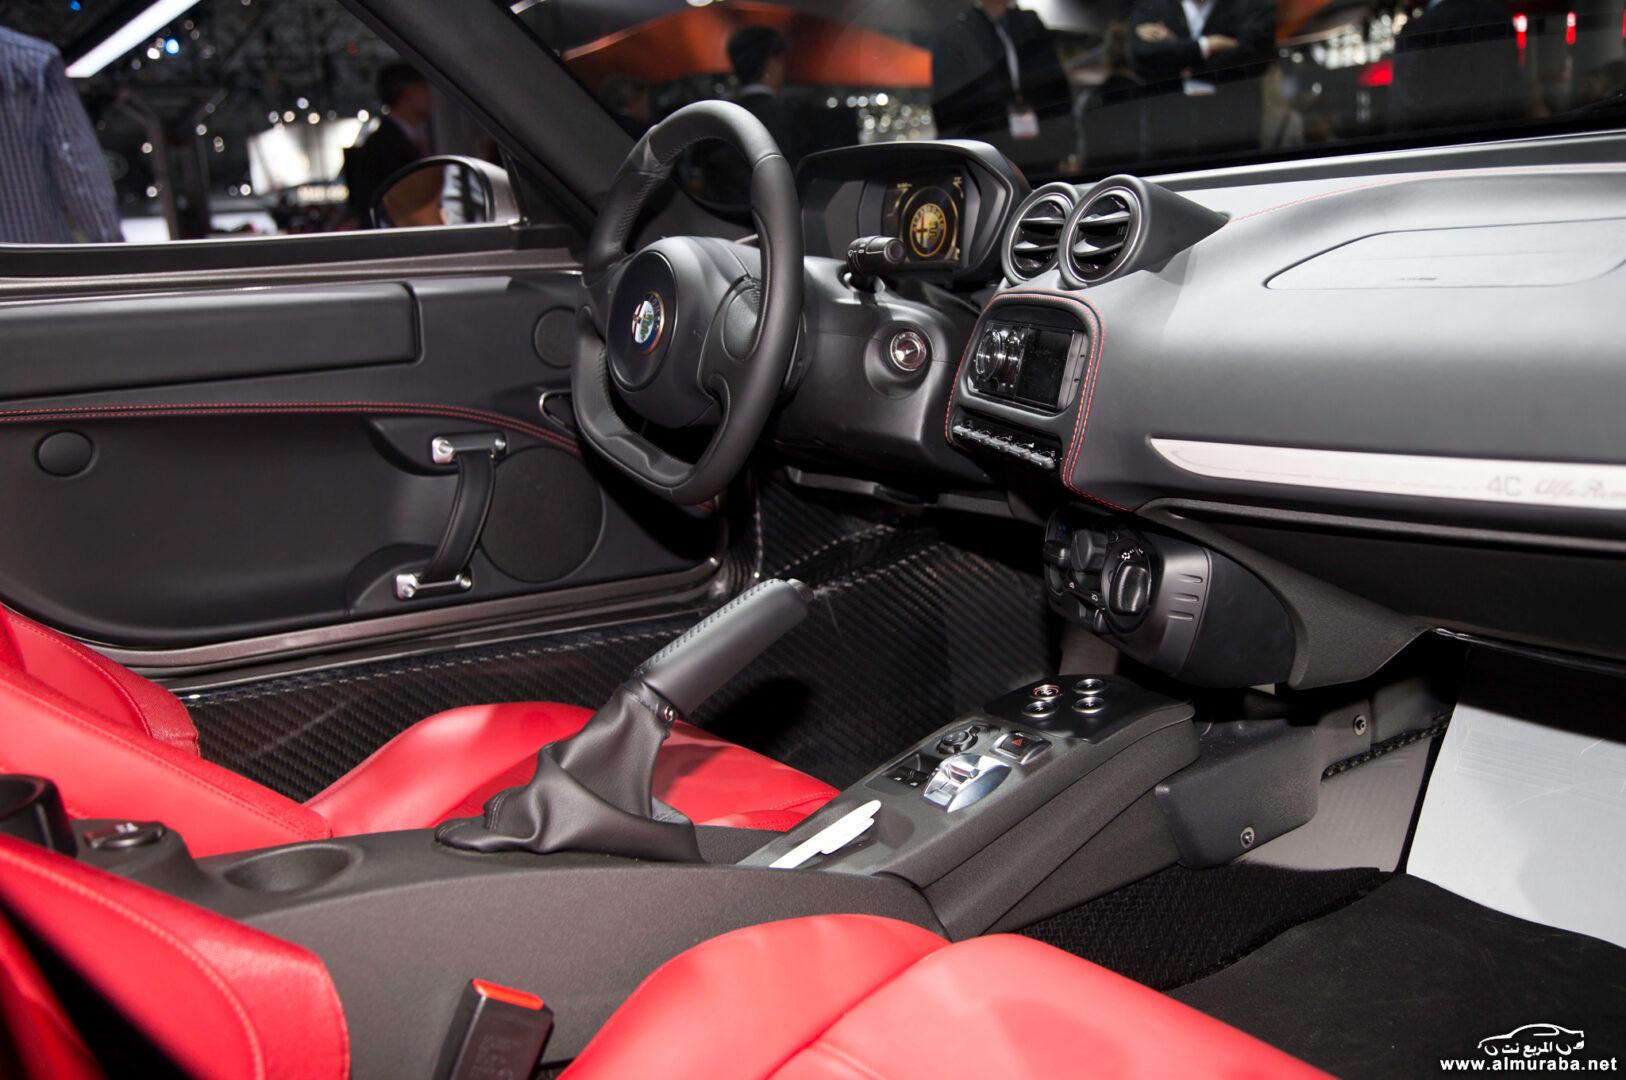 http---image.motortrend.com-f-wot-1404_2015_alfa_romeo_4c_launch_edition_arrives_this_june-72848112-2015-Alfa-Romeo-4C-Launch-Edition-interior-03